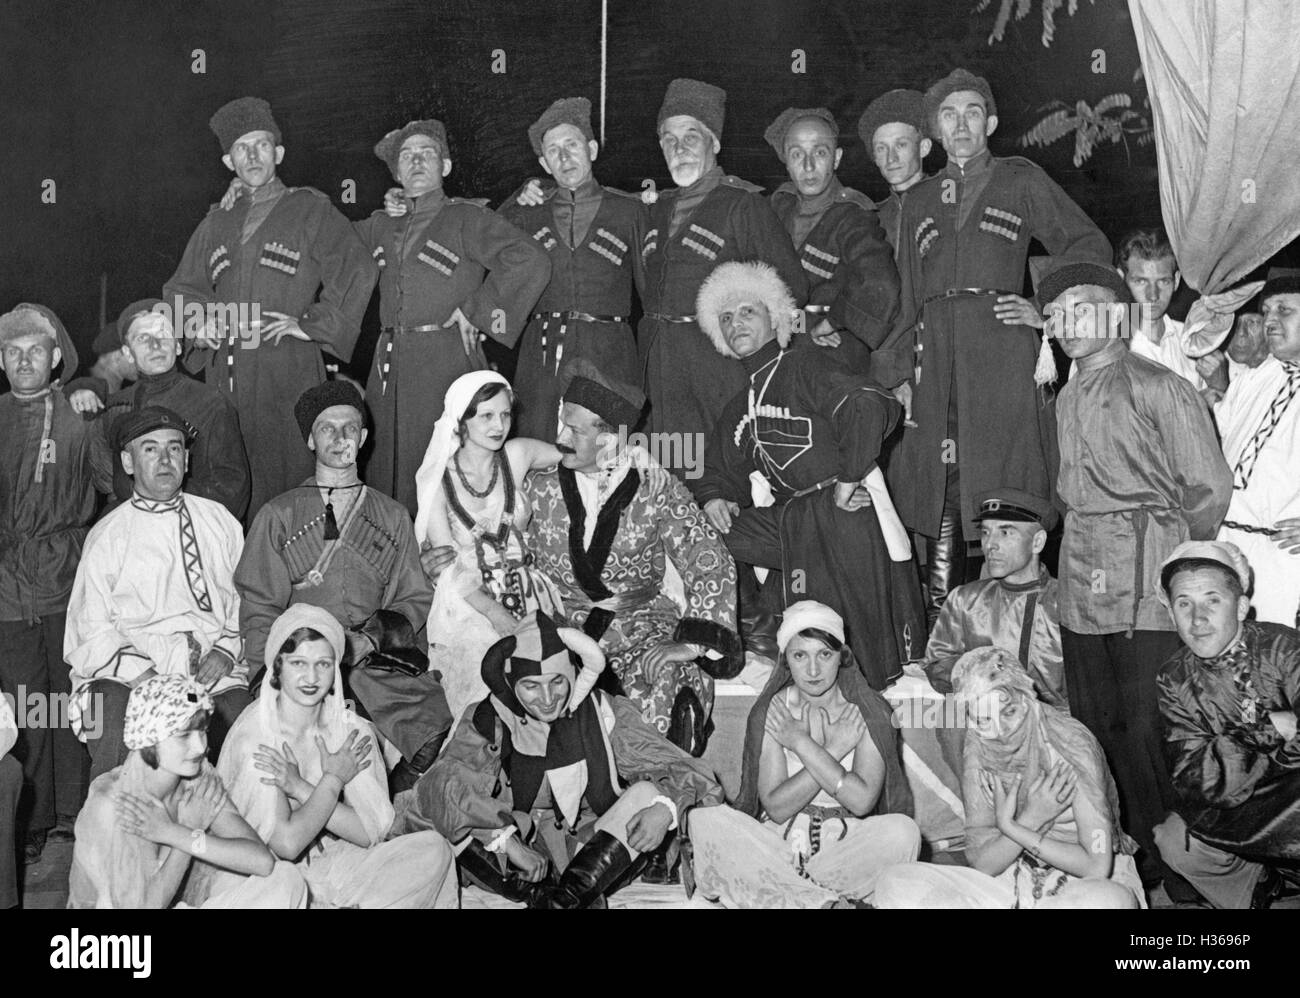 Russian National Socialists in Berlin, 1933 - Stock Image